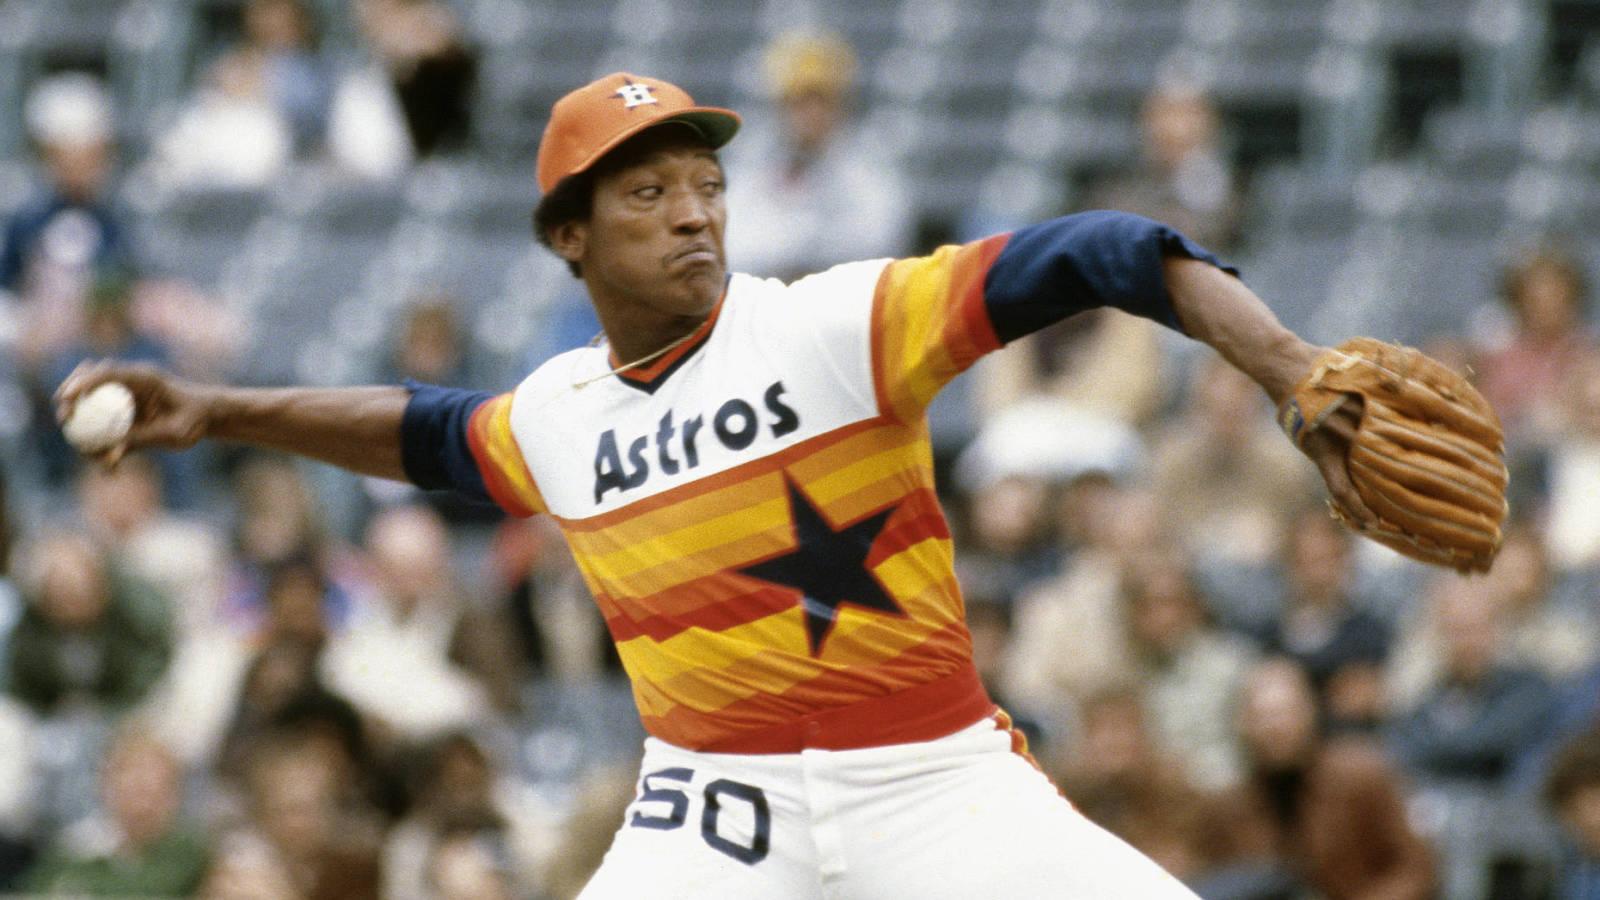 Legendary Astros pitcher JR Richard dies at 71